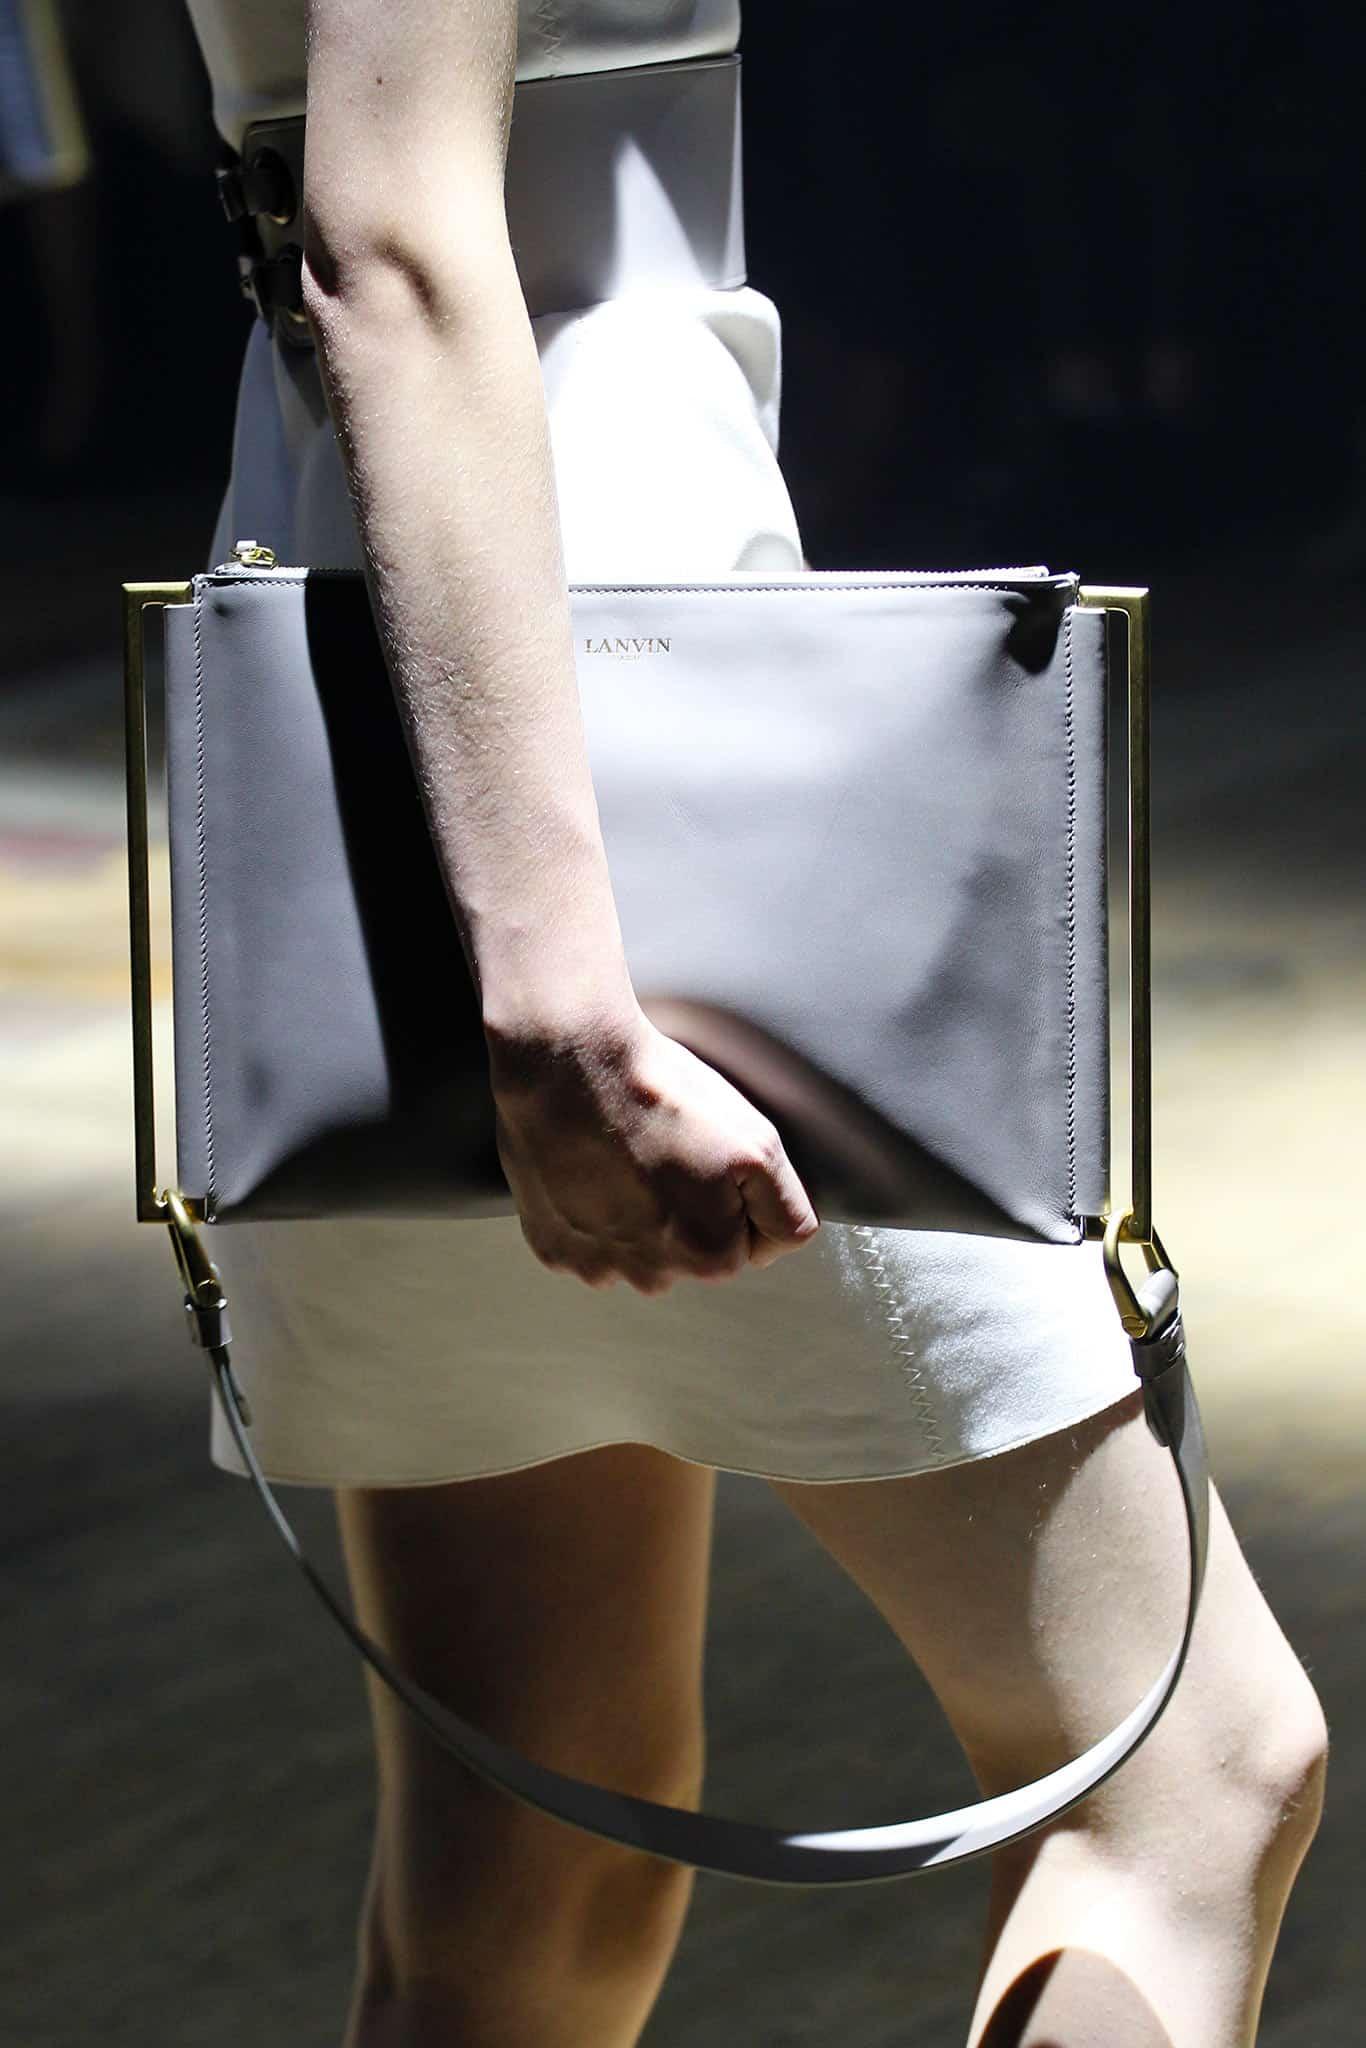 lanvin-street-style-bags-2015